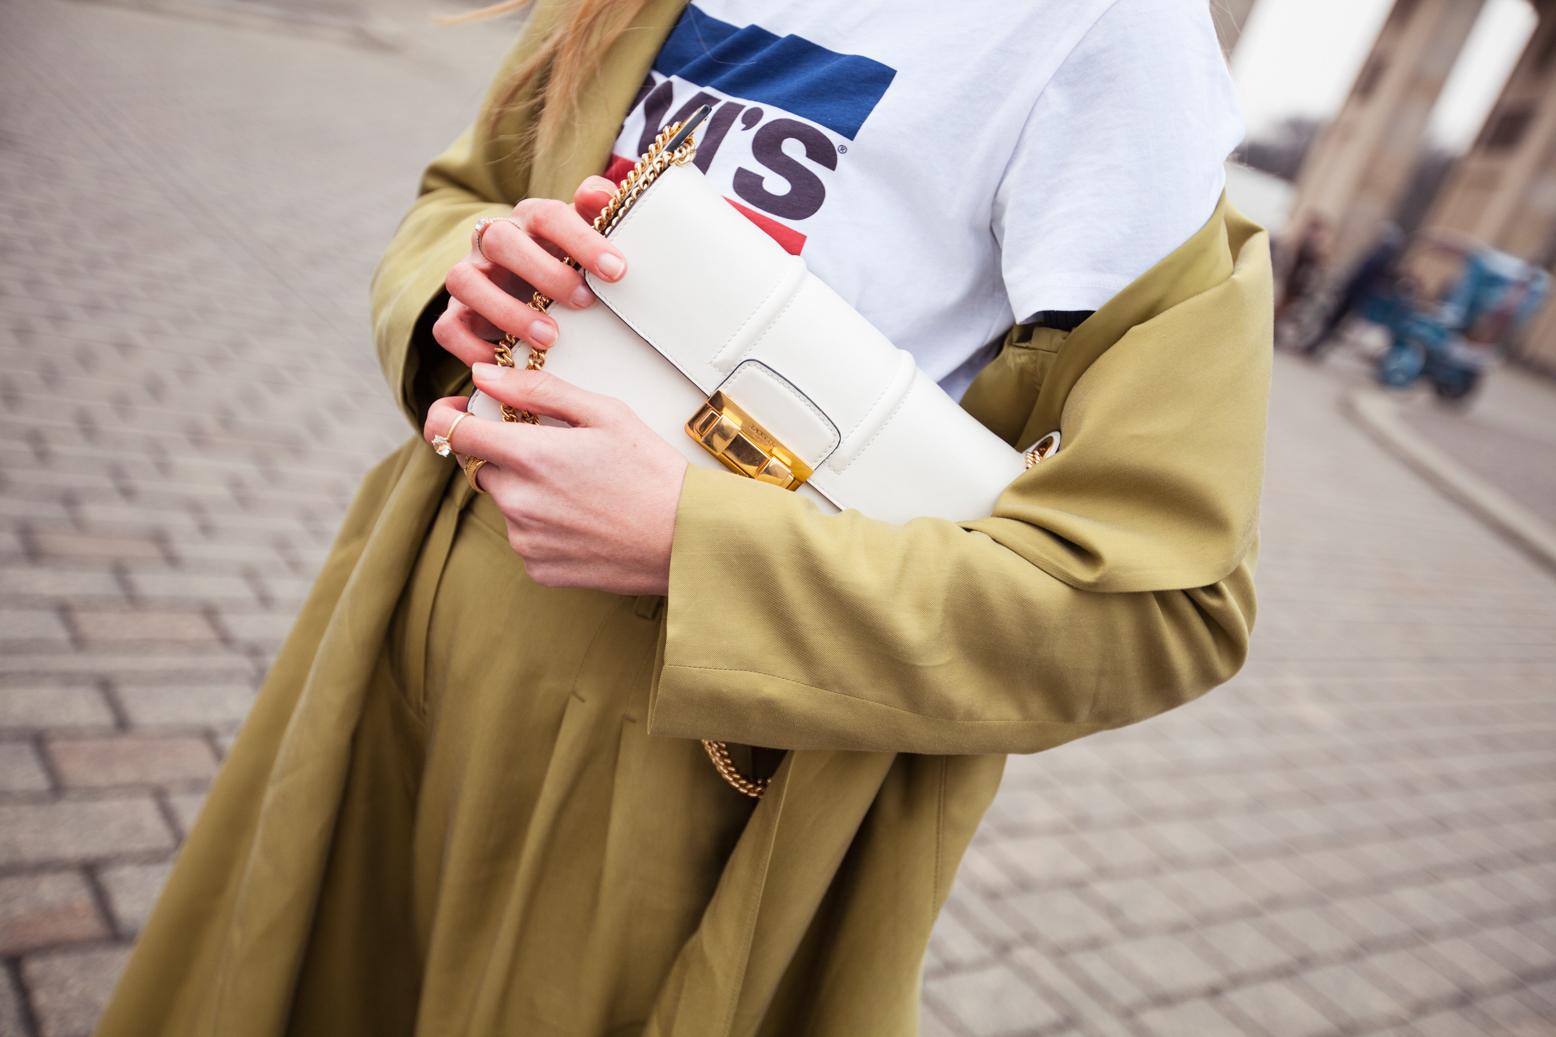 fashionweek-streetstyle-ivy&oak-livia-auer-6039